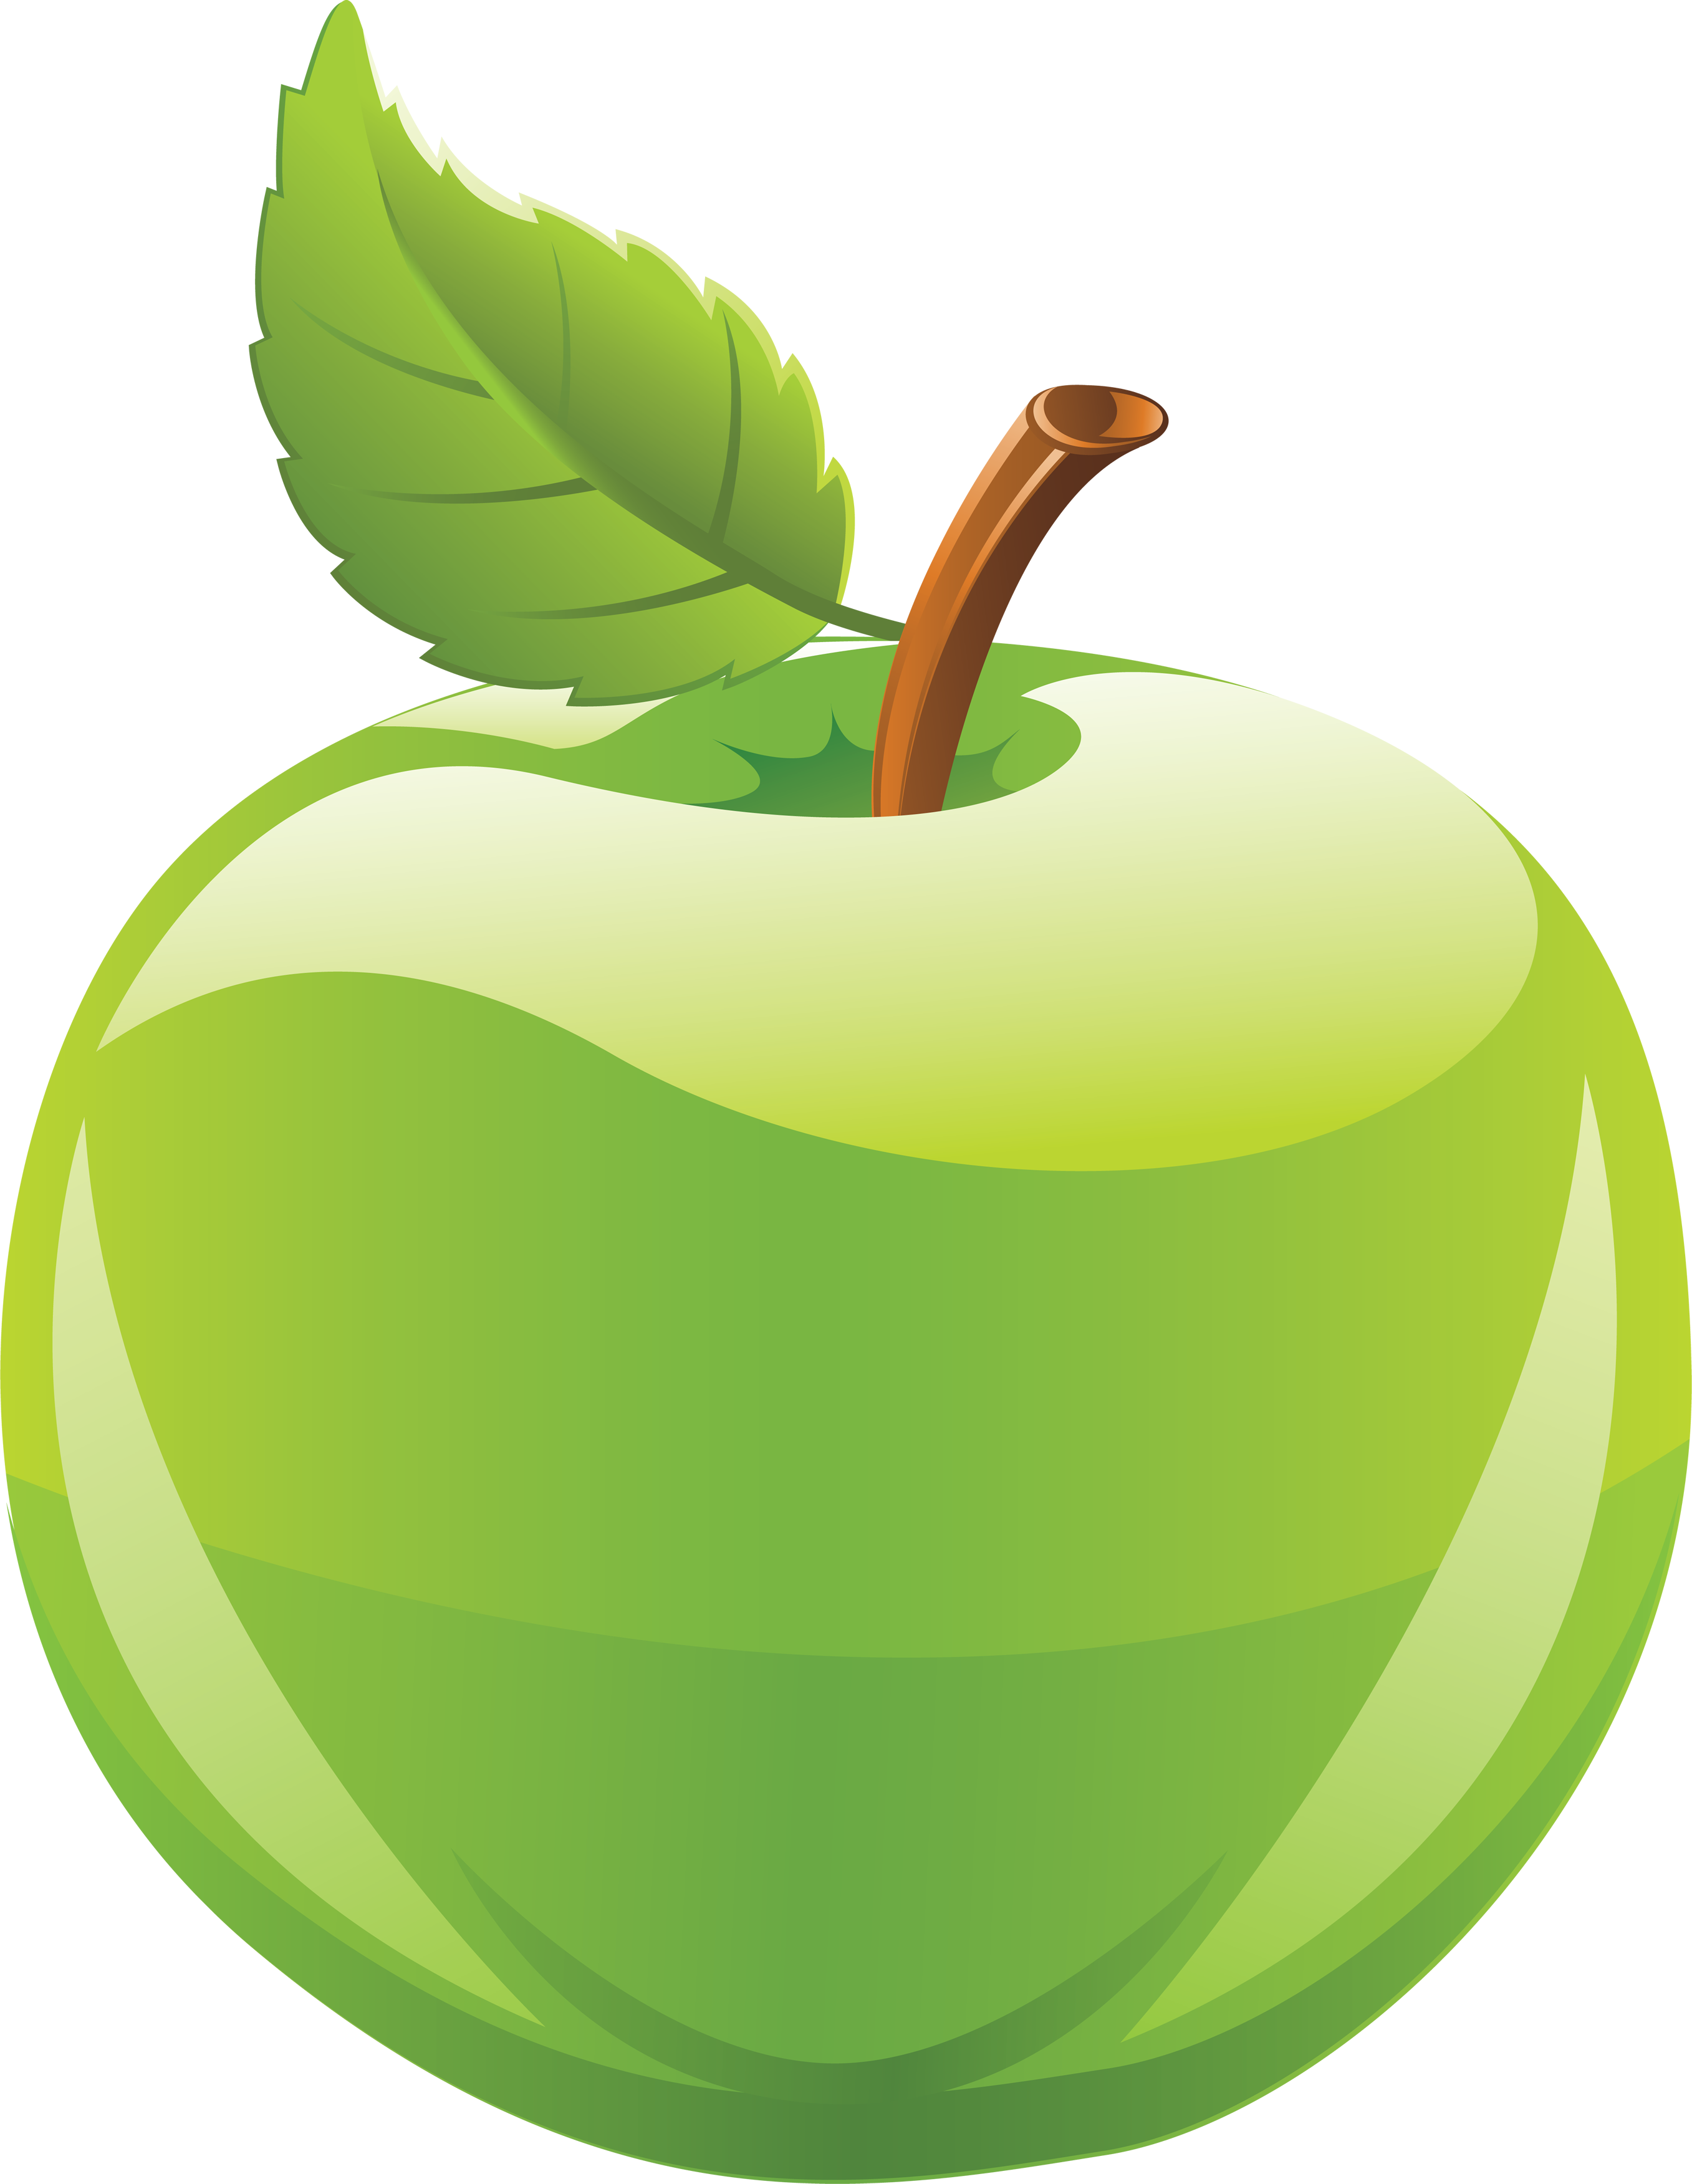 2714x3504 Green Apples Clipart Apple Clip Art Images